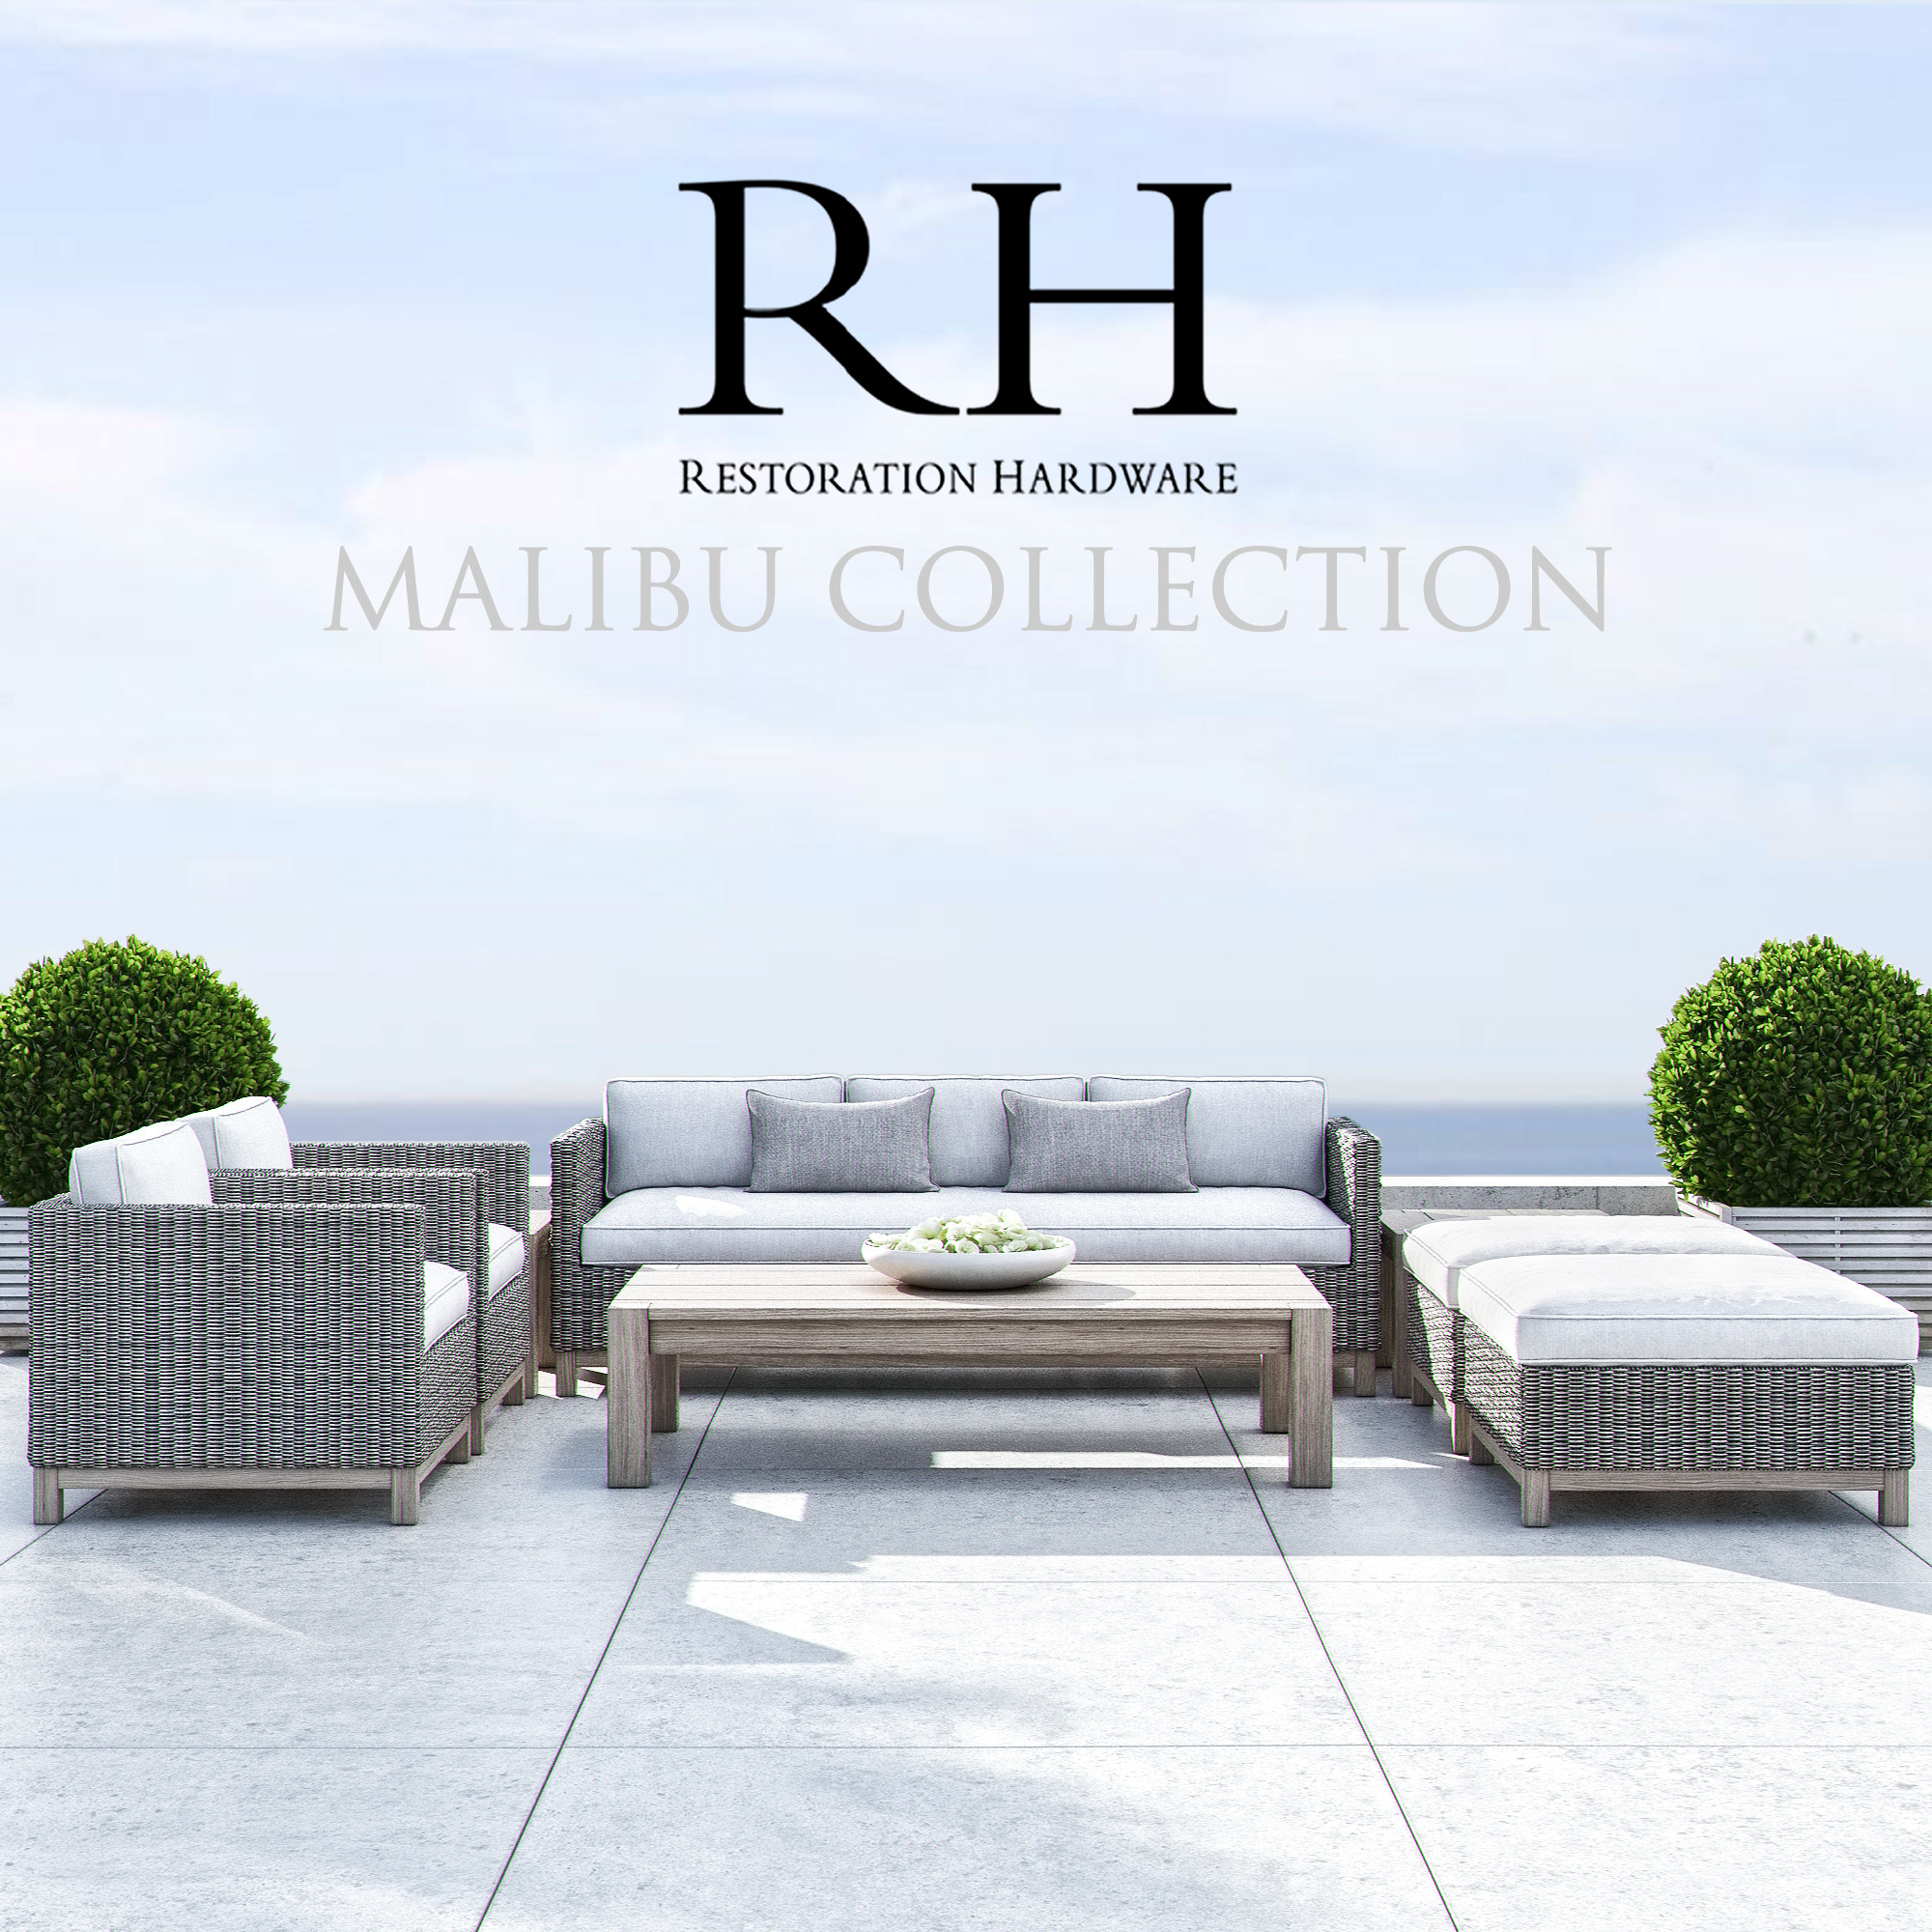 Restoration Hardware - Malibu Collection